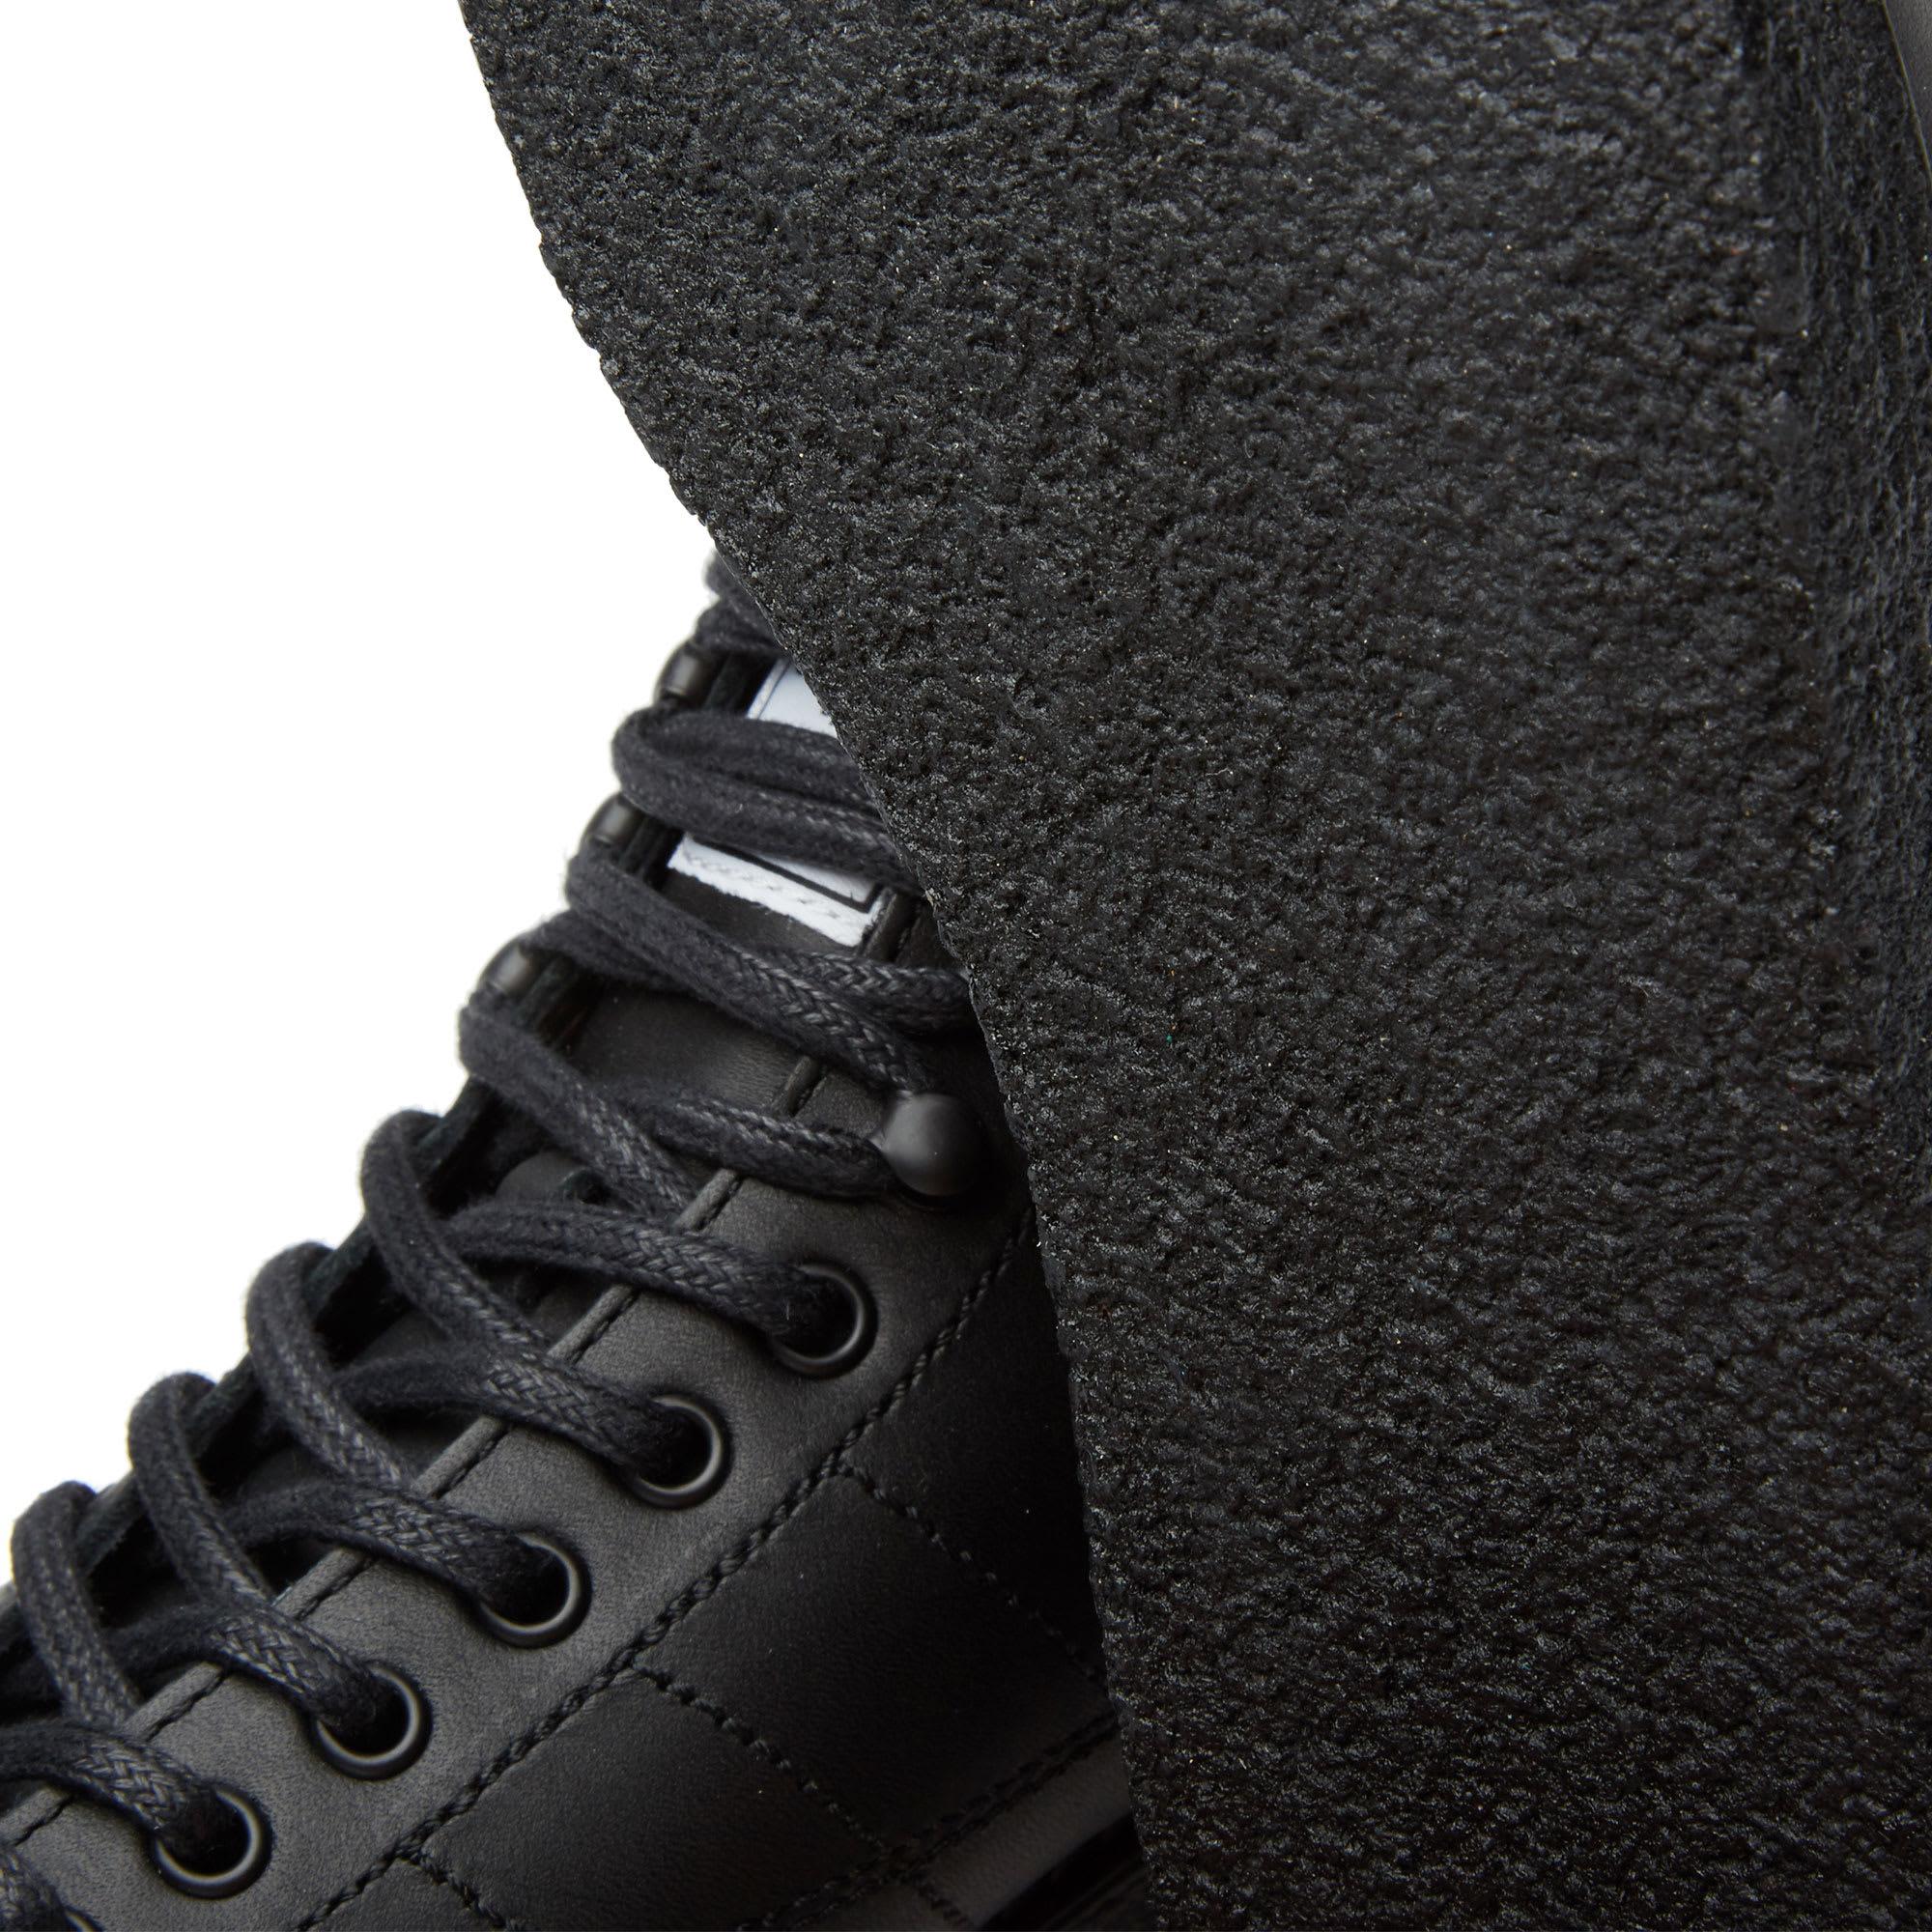 reputable site c4d3c 638c8 Adidas x Neighborhood Shelltoe Boot Core Black | END.